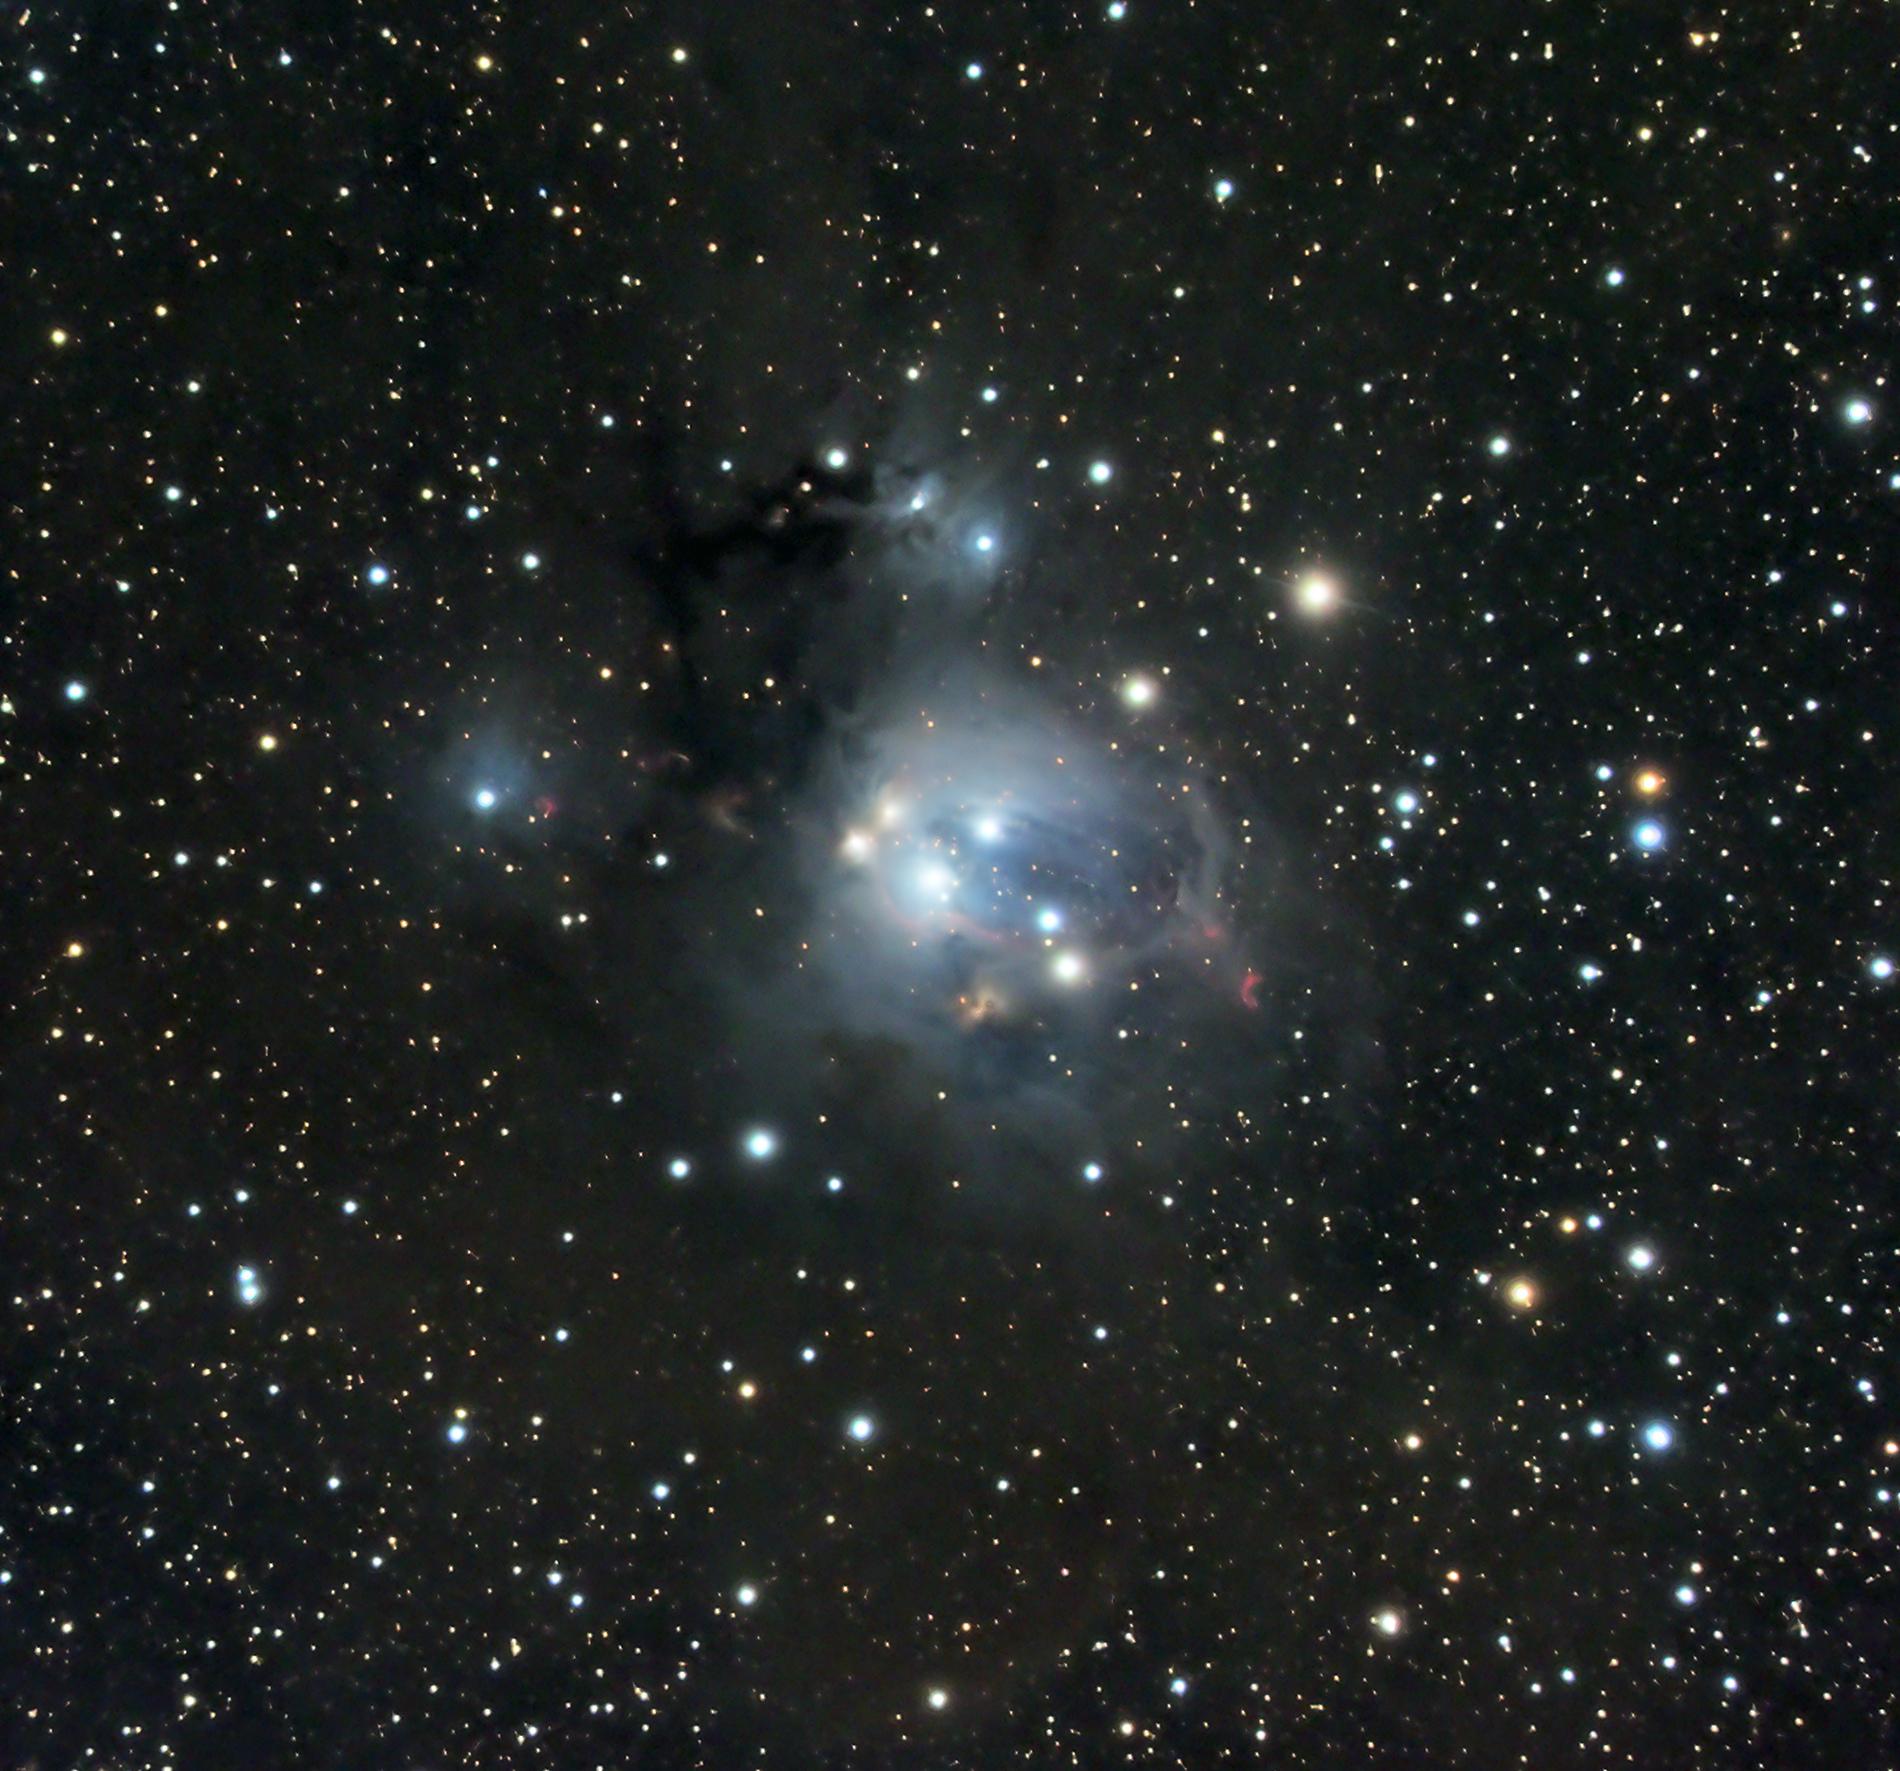 NGC7129.jpg.49c37fa49077b8c6d7f62c36e1e0cf80.jpg